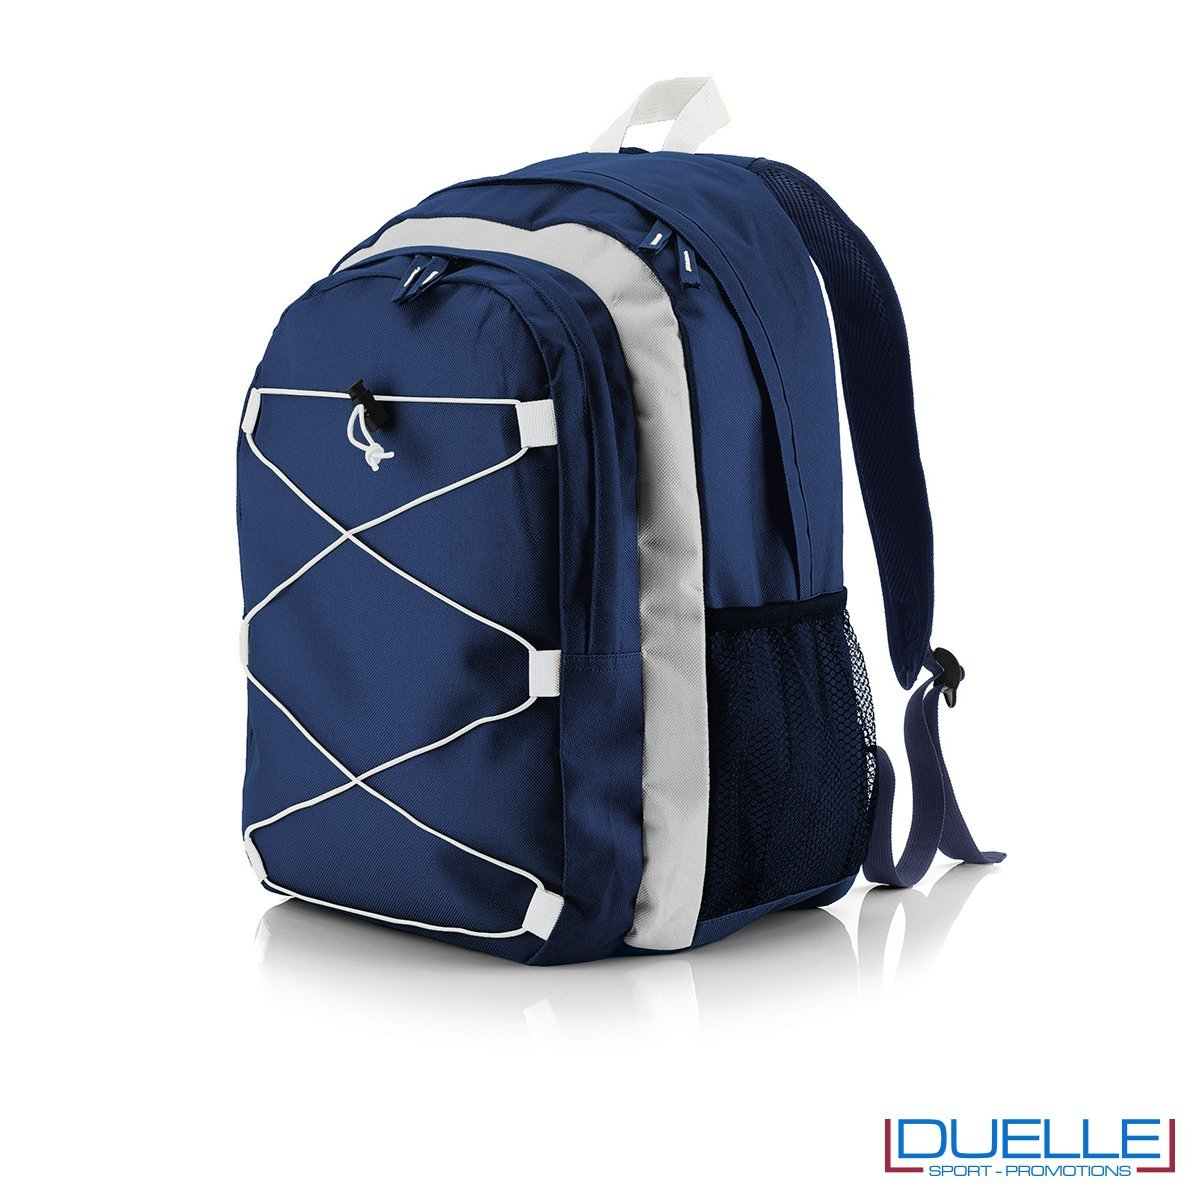 zaino personalizzato sportivo blu navy-bianco, gadget sport trekking. Zaino tipo The north face